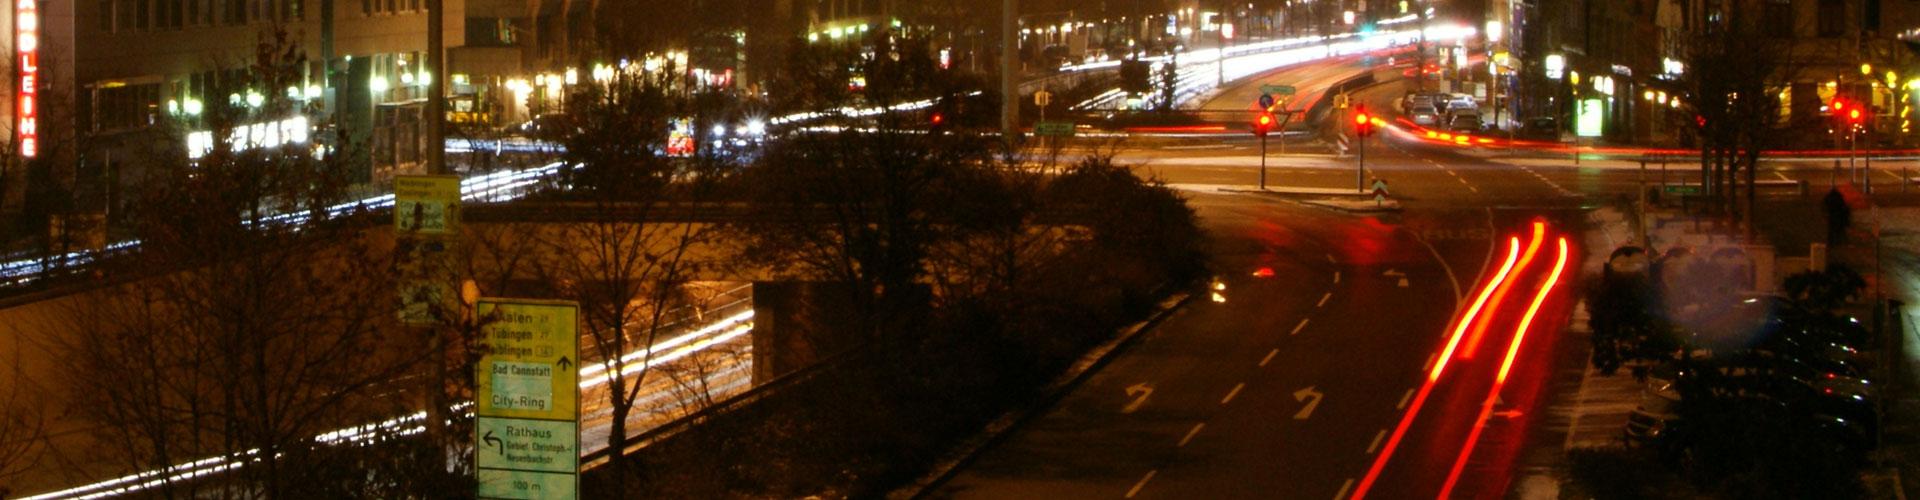 Stuttgarter Straße bei Nacht (Bild: flickr.com/Martin Abegglen CC BY-SA).